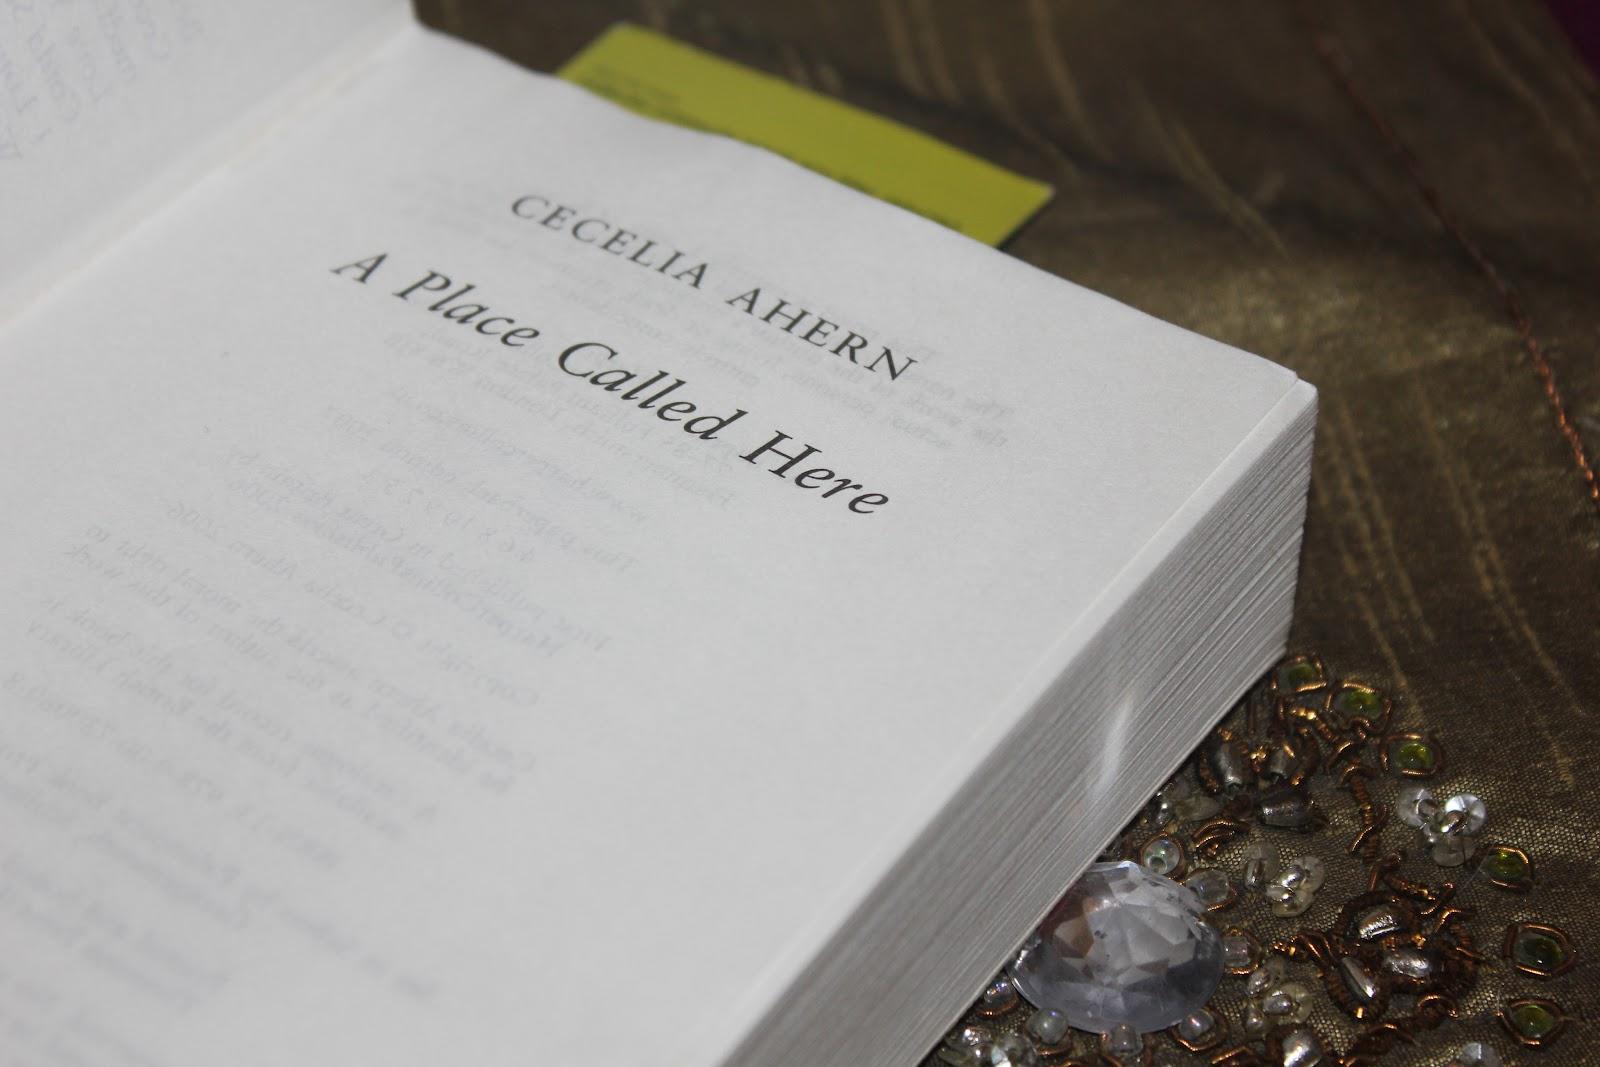 Cecelia Ahern's quote #3